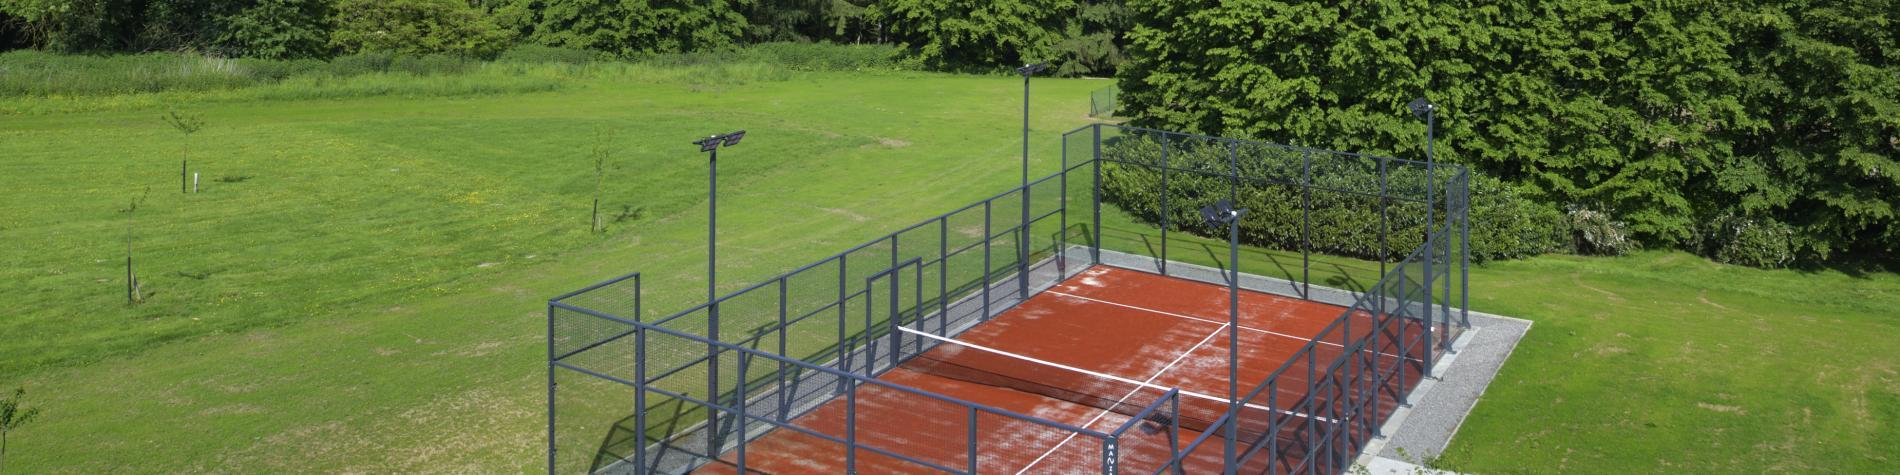 Ibis Style Hotel & Events - Louvain-la-Neuve - Paddle tennis